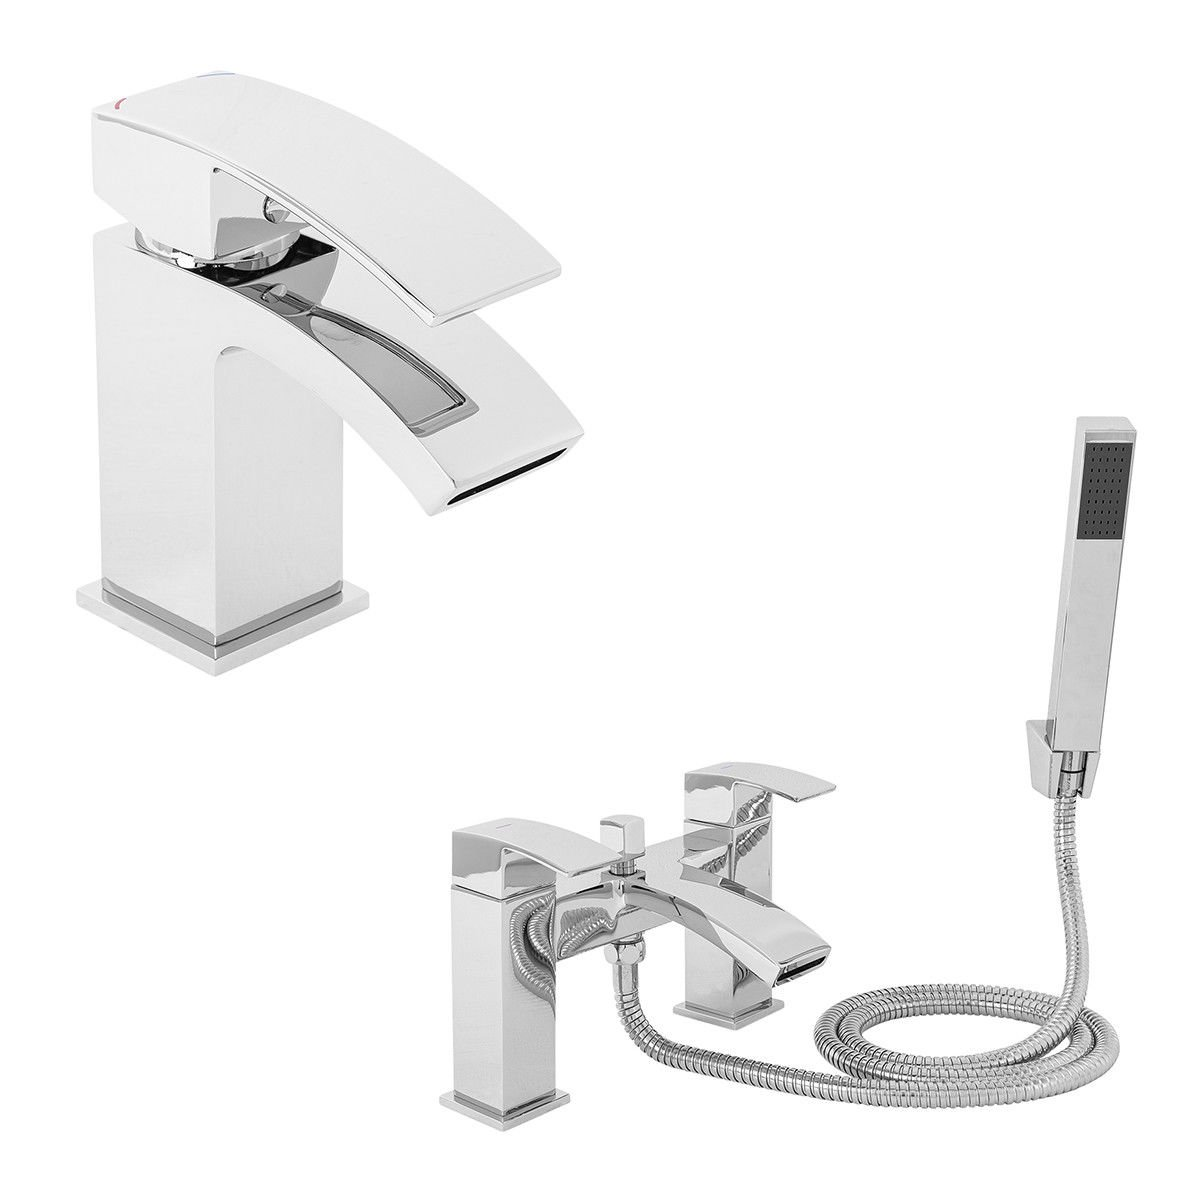 Generic s Pack S Bath Shower ath Show Mixer Tap Tap Ba Modern Bathroom Chrome Sin Mixer Taps Pack Set me Basin Sink Basin Sink